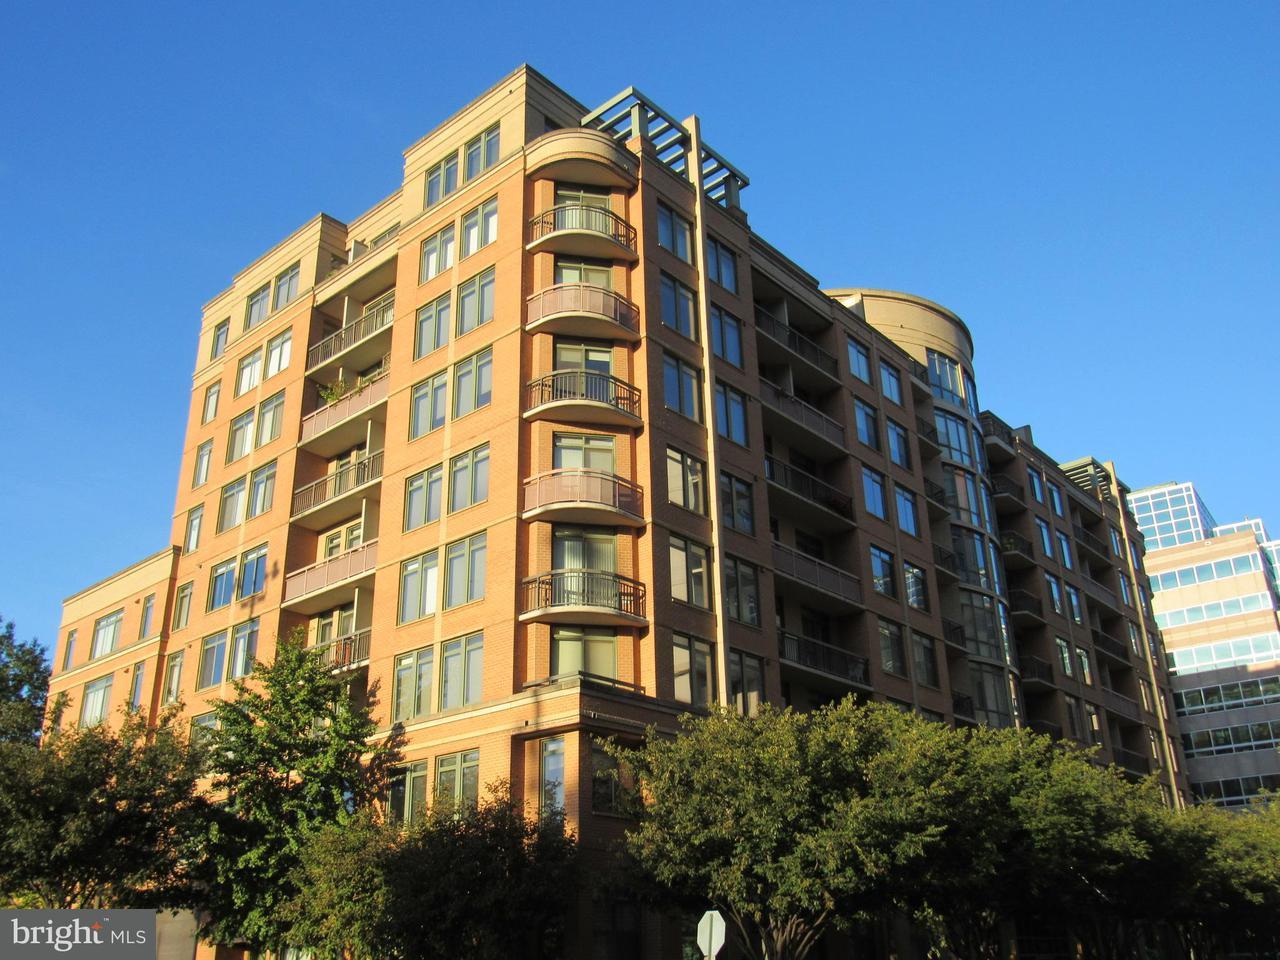 Condominium for Sale at 3625 10TH ST N #803 3625 10TH ST N #803 Arlington, Virginia 22201 United States